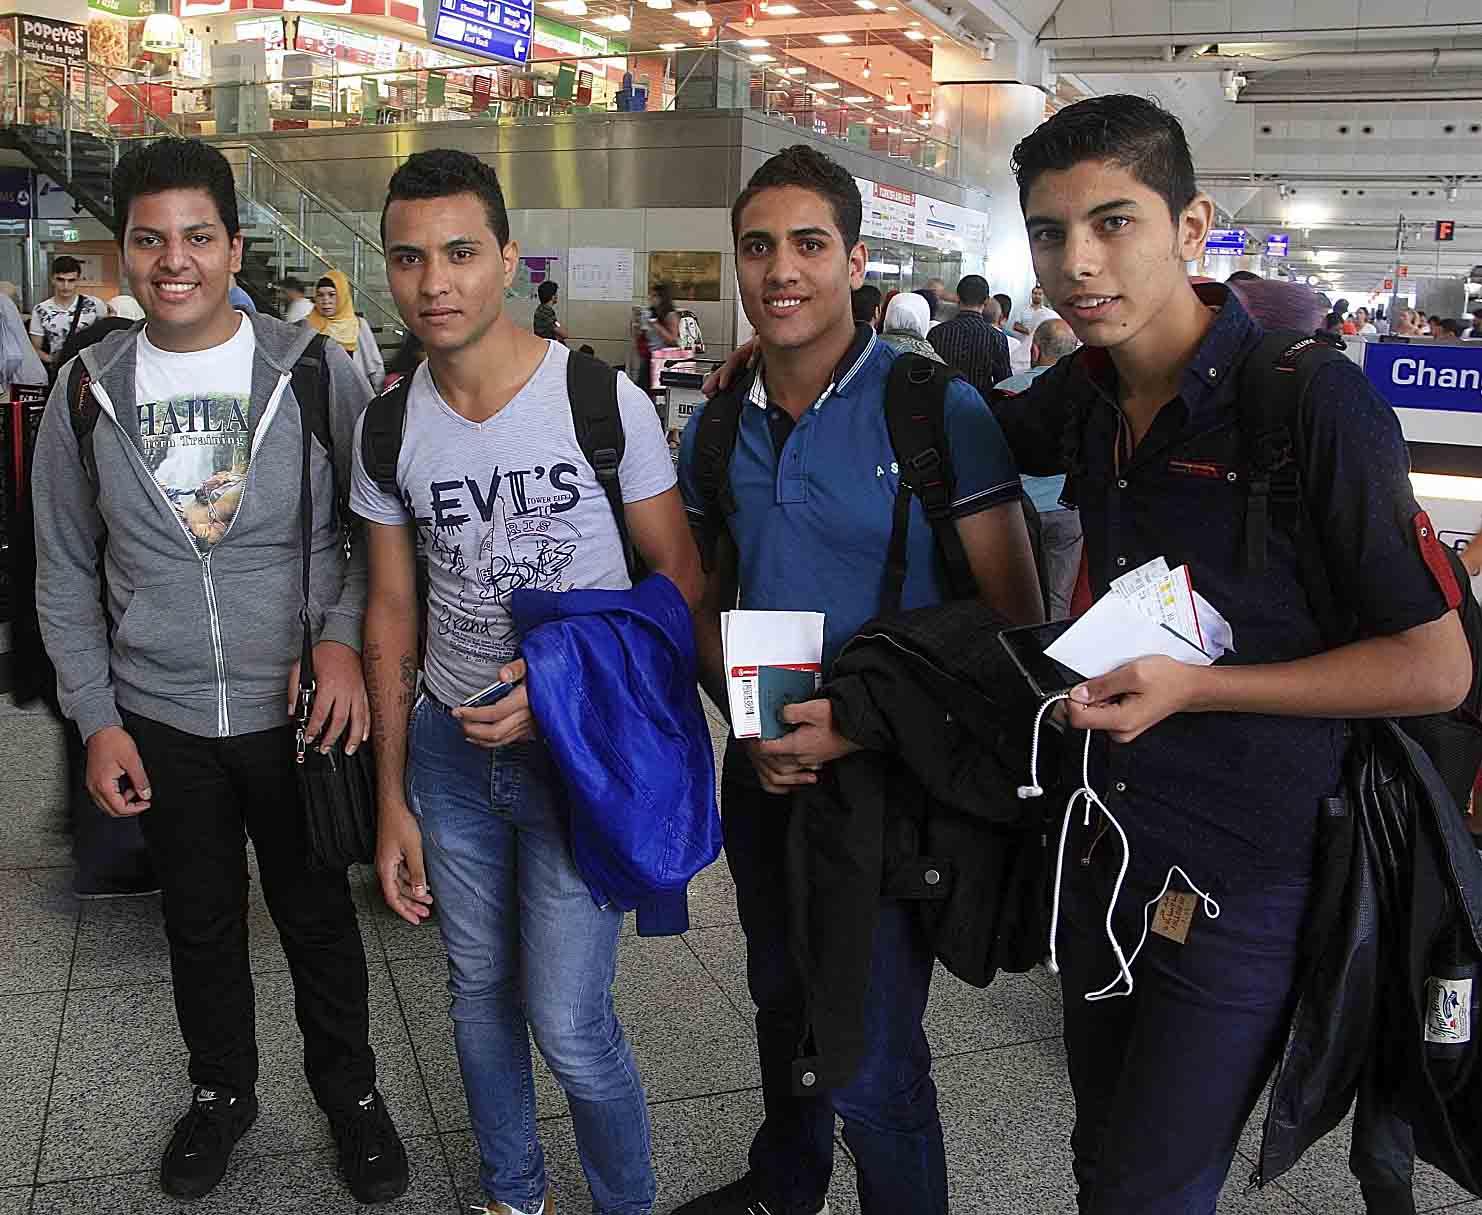 (From left) Moller Yasa, Klenton Faragalla, Bassem Younan and Albir Shehata at Istanbul Ataturk Airport before departure. (Morning Star News)